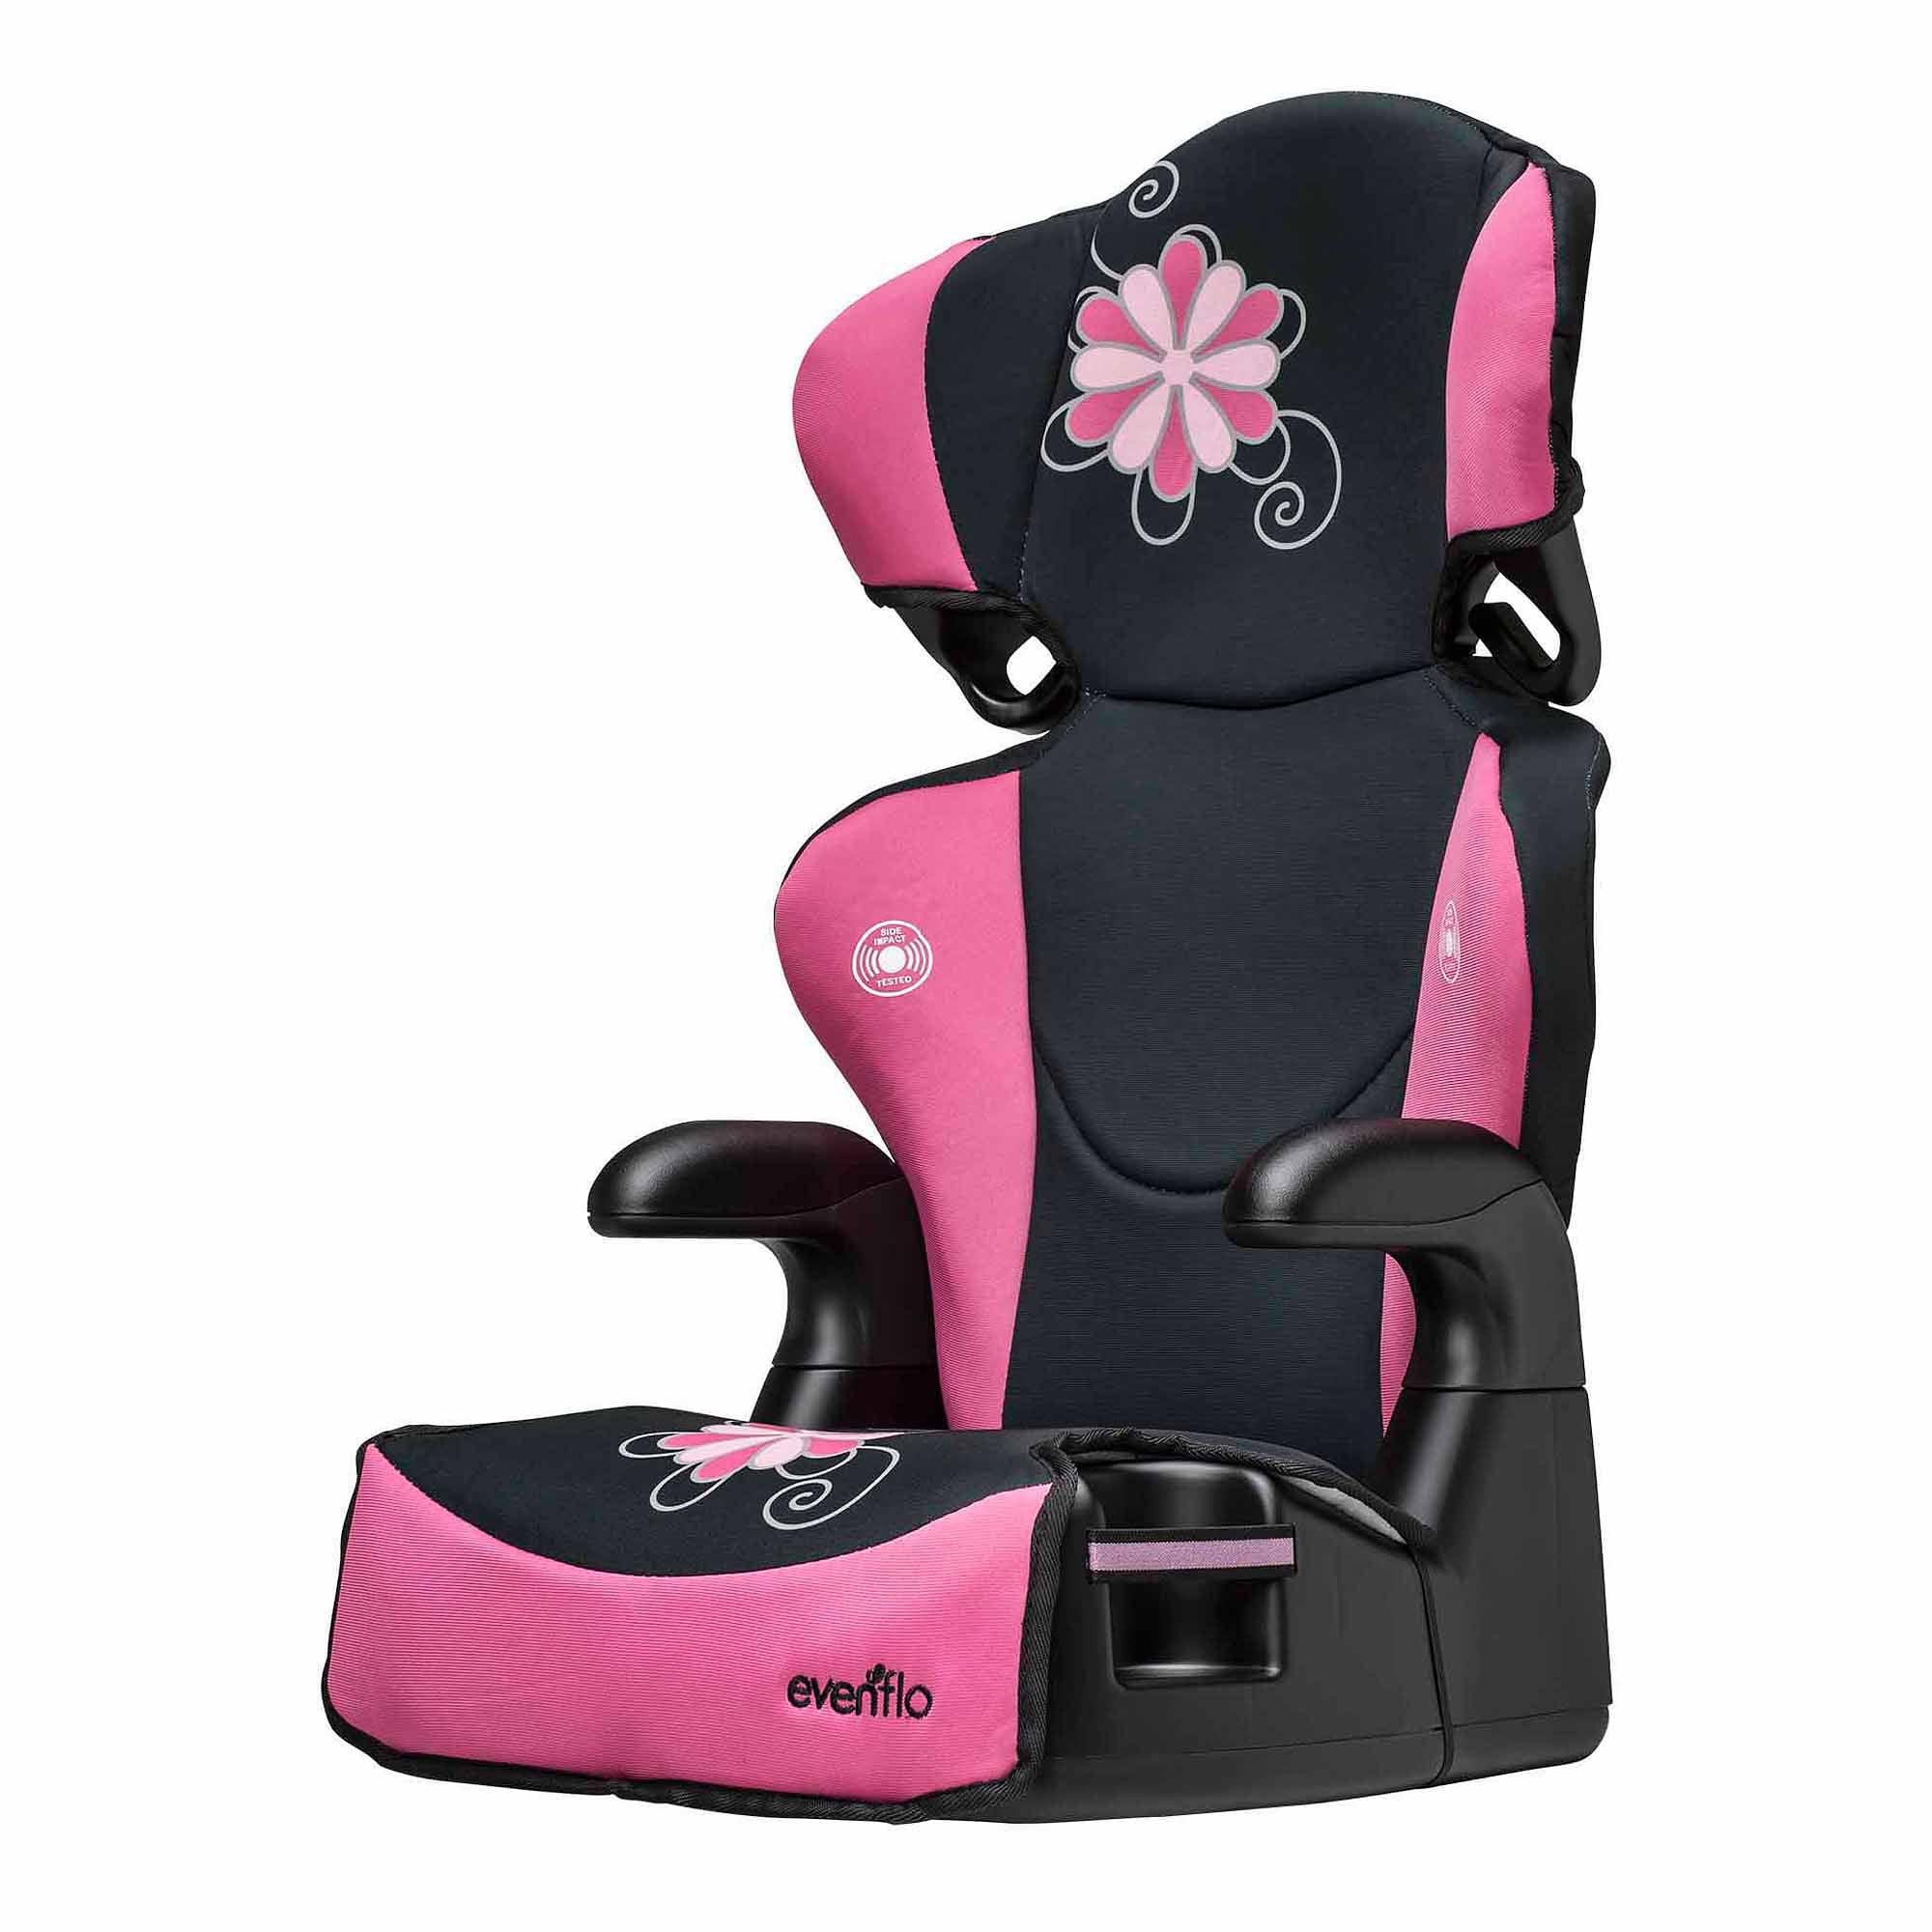 Evenflo Big Kid Sport High Back Booster Car Seat, Danica